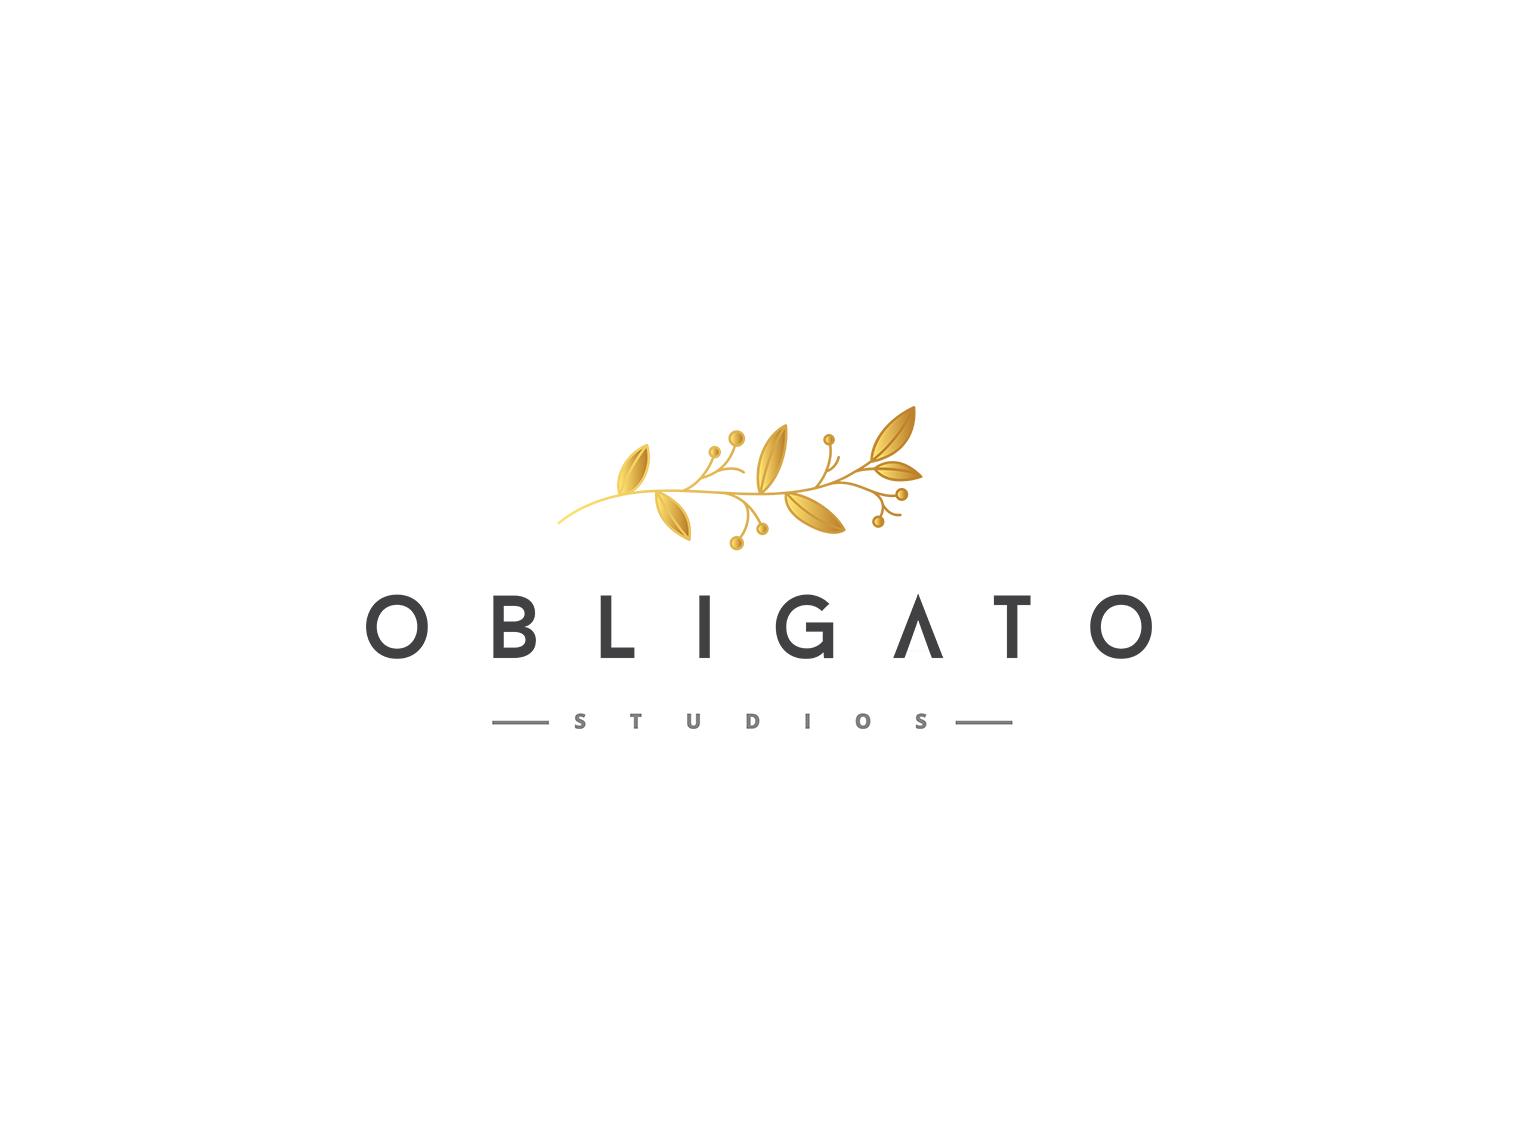 OBLIGATO PHOTO STUDIO illustraion design logo branding branding design brand identity photography